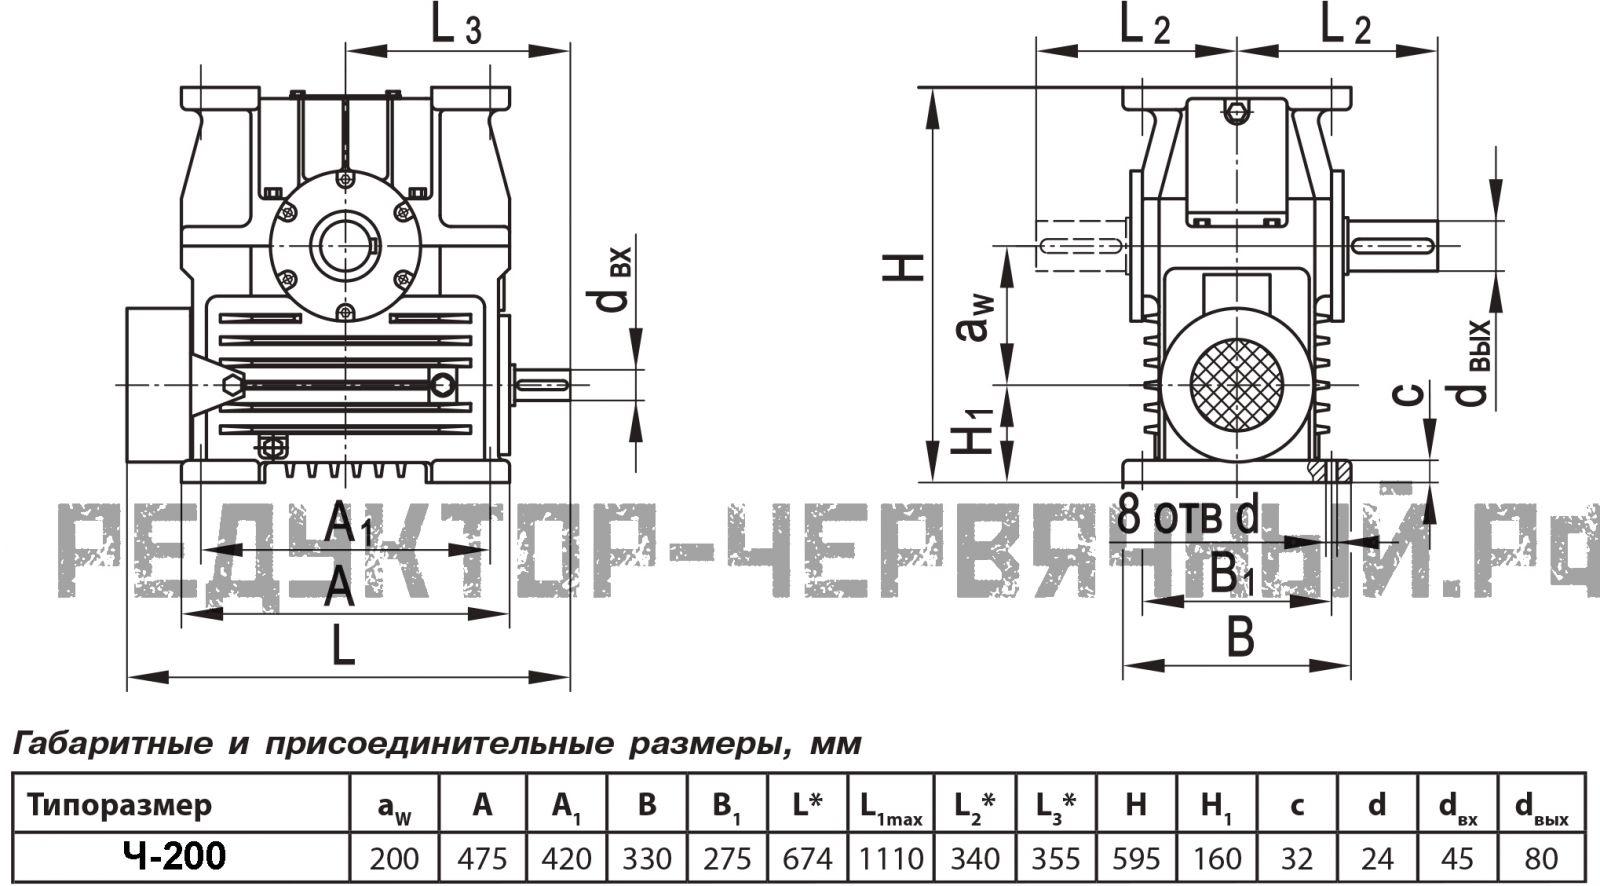 Чертеж редуктора Ч 200